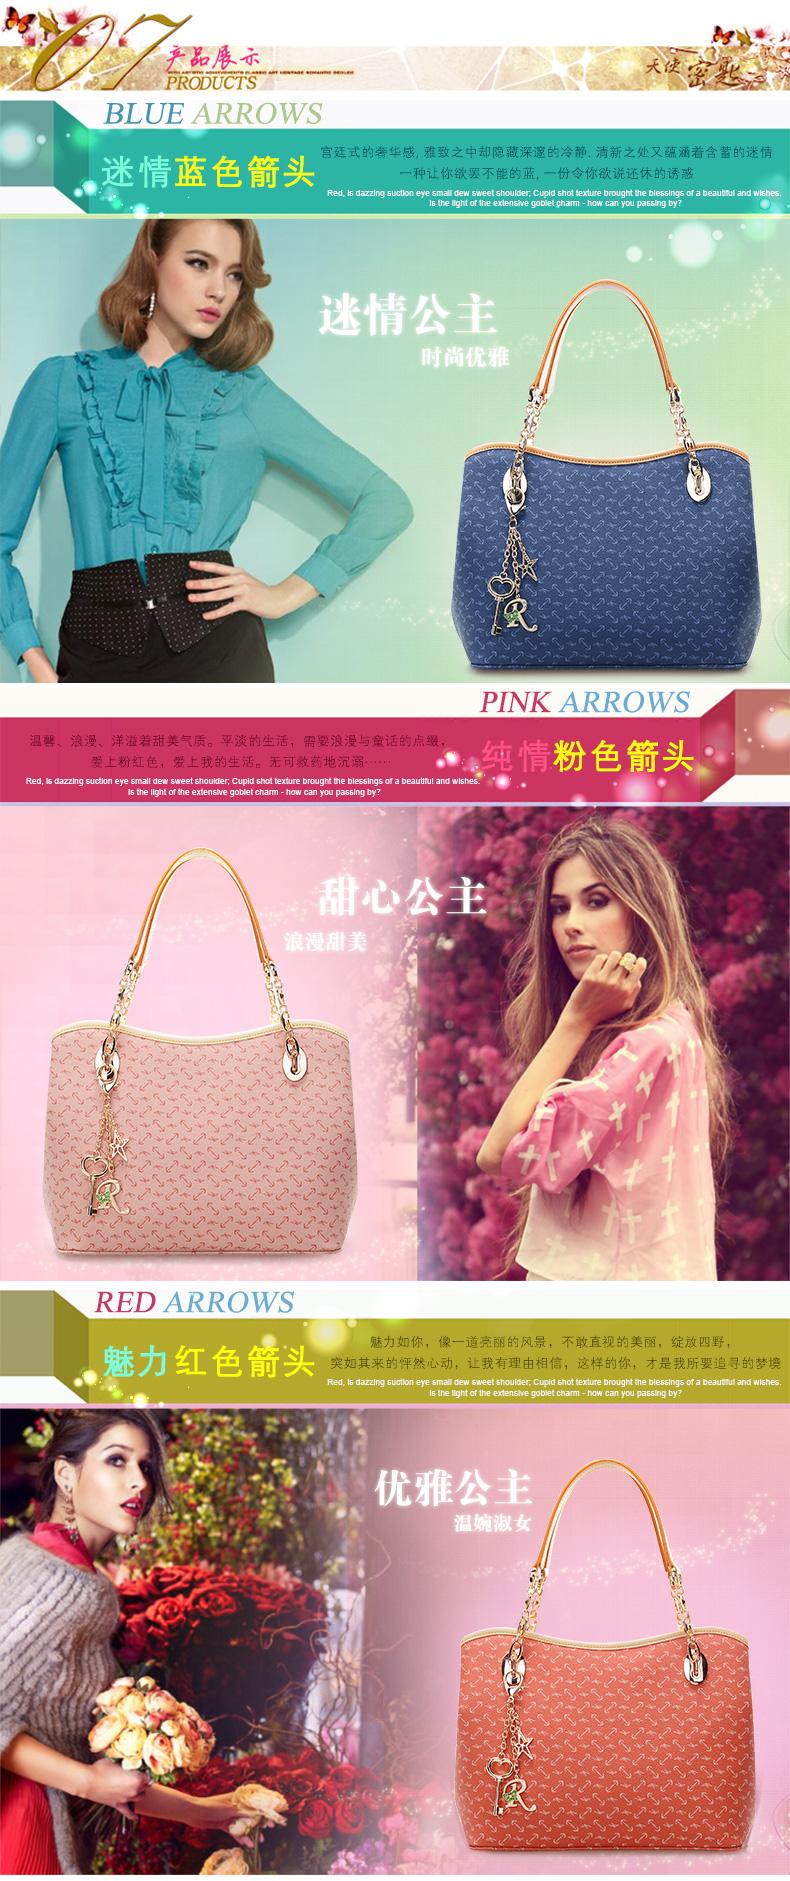 Brand 2016 Elegant Bag 2016 Luxury Handbags Women Bags Designer Promotion New Design Women Totes